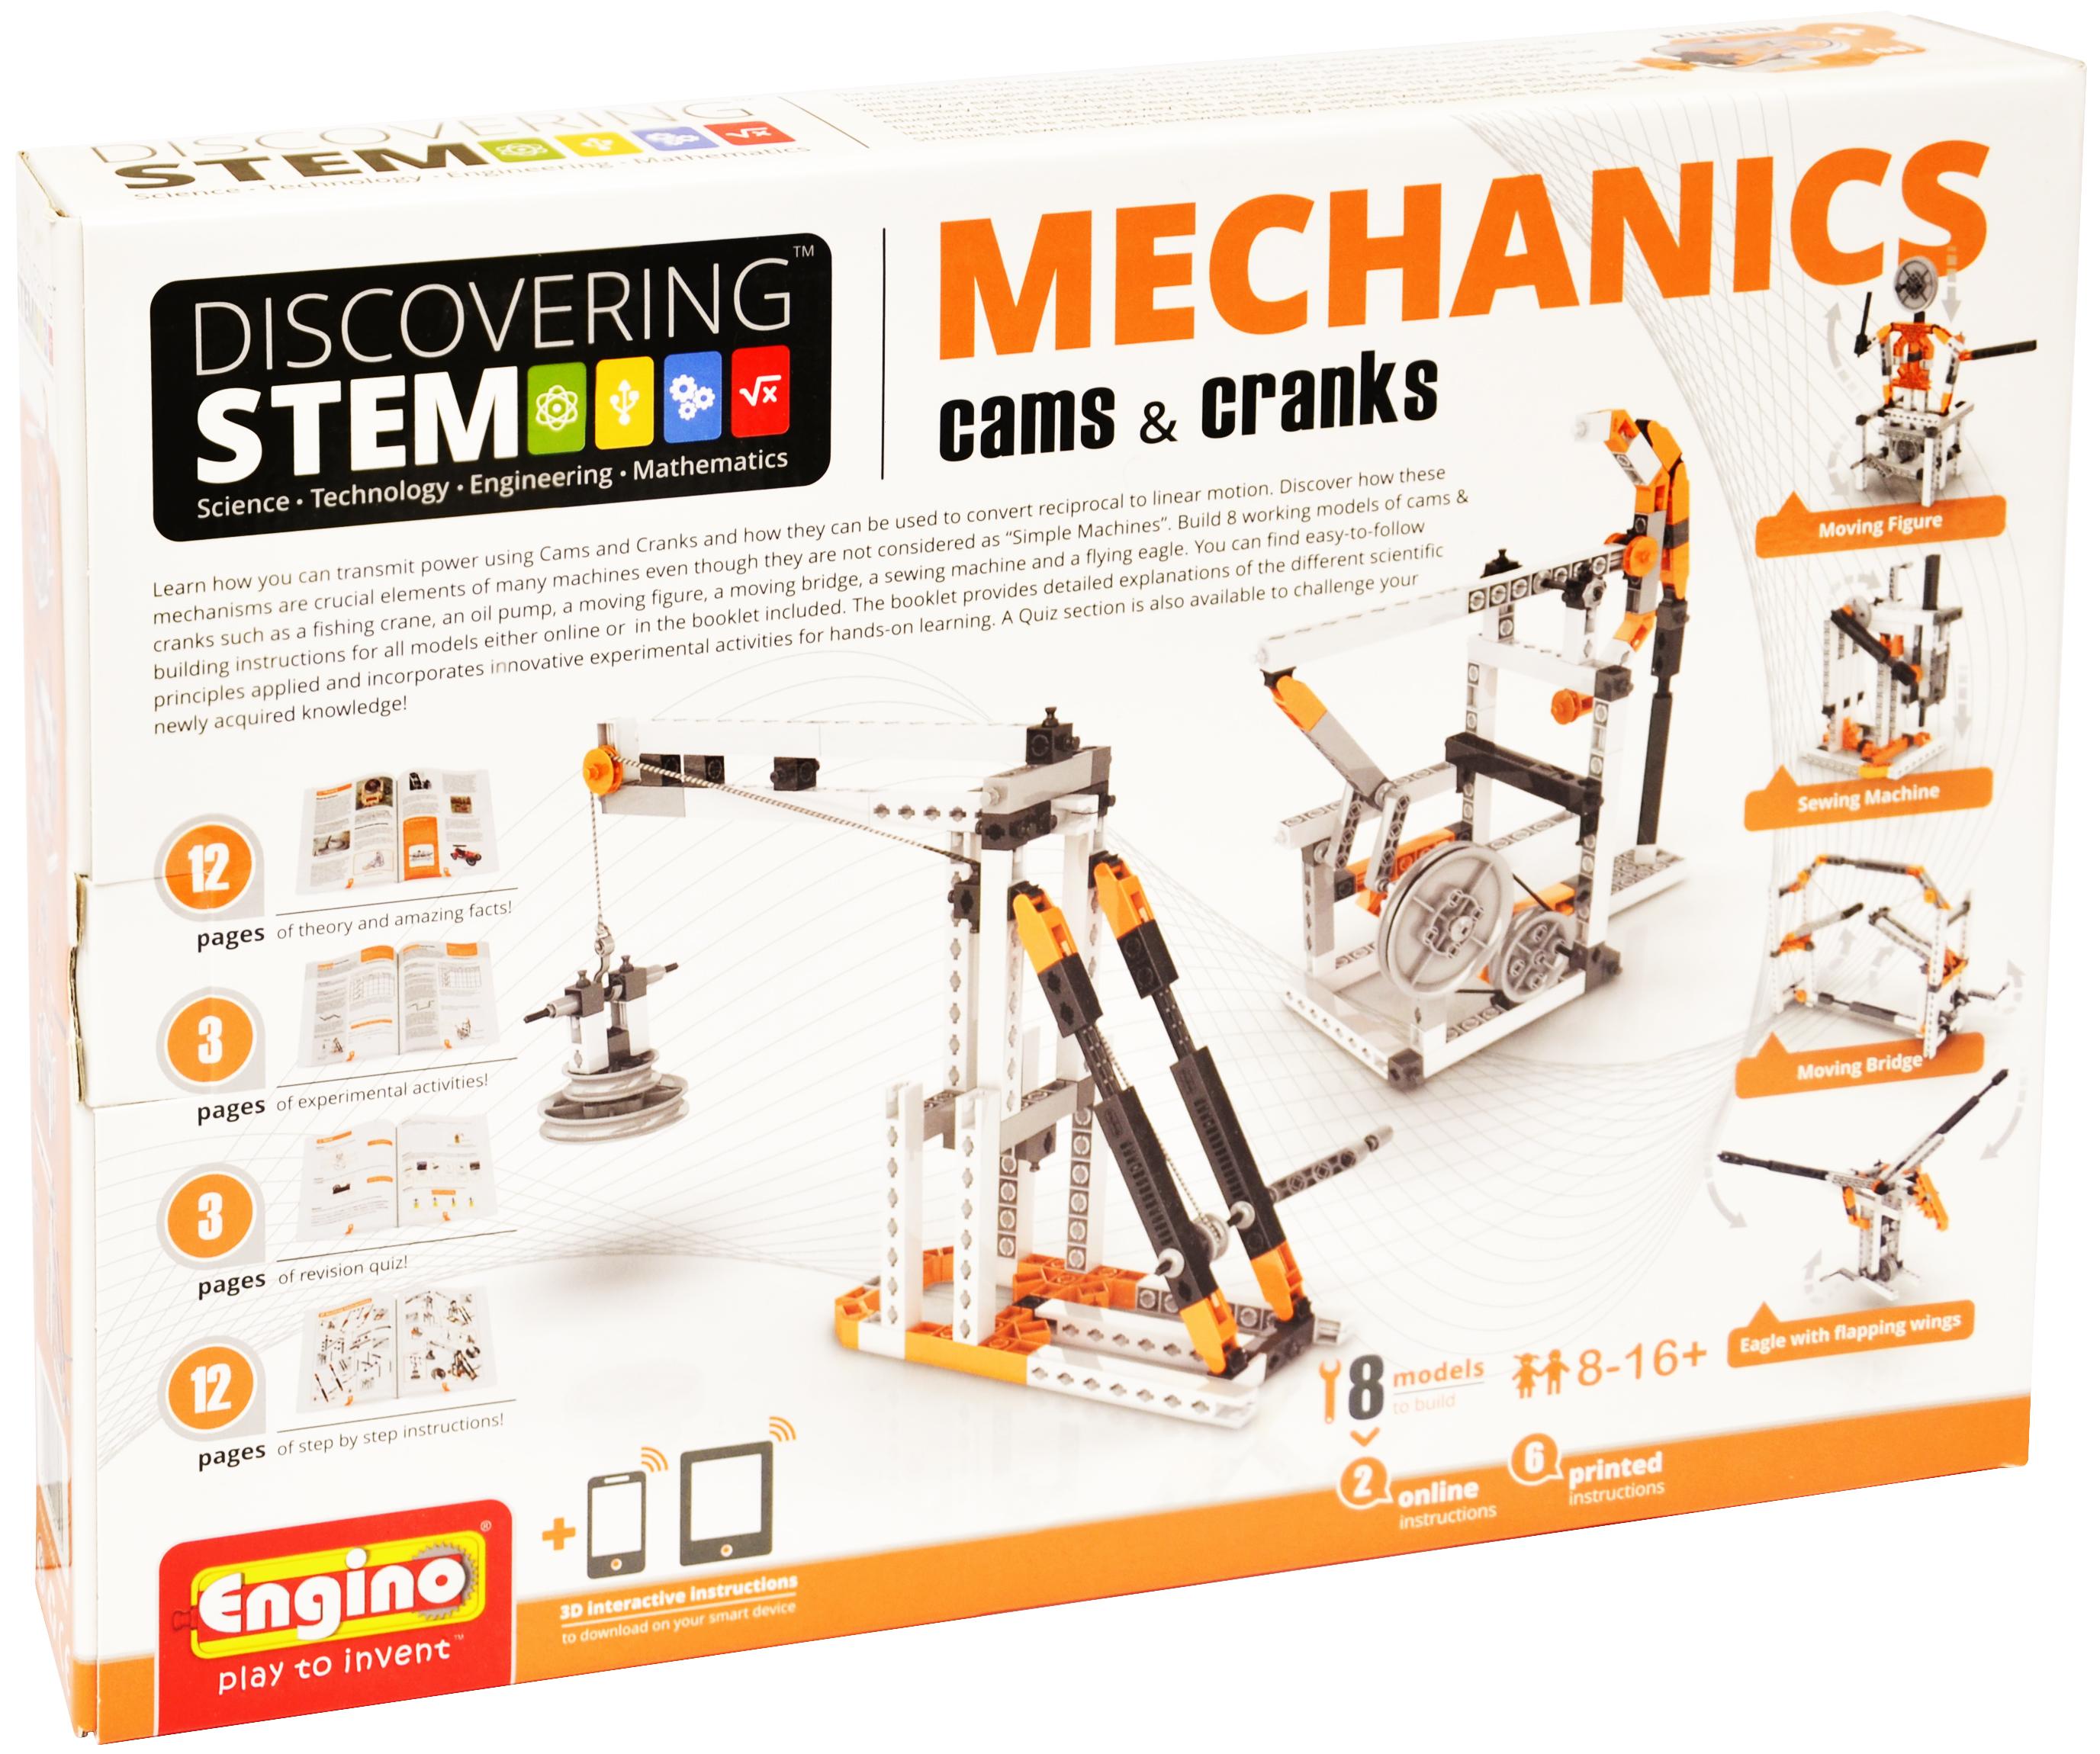 Stem Mechanics Cams Crank Educational Toys By Elenco Electronics Electronic Watchdog Kit Electronix